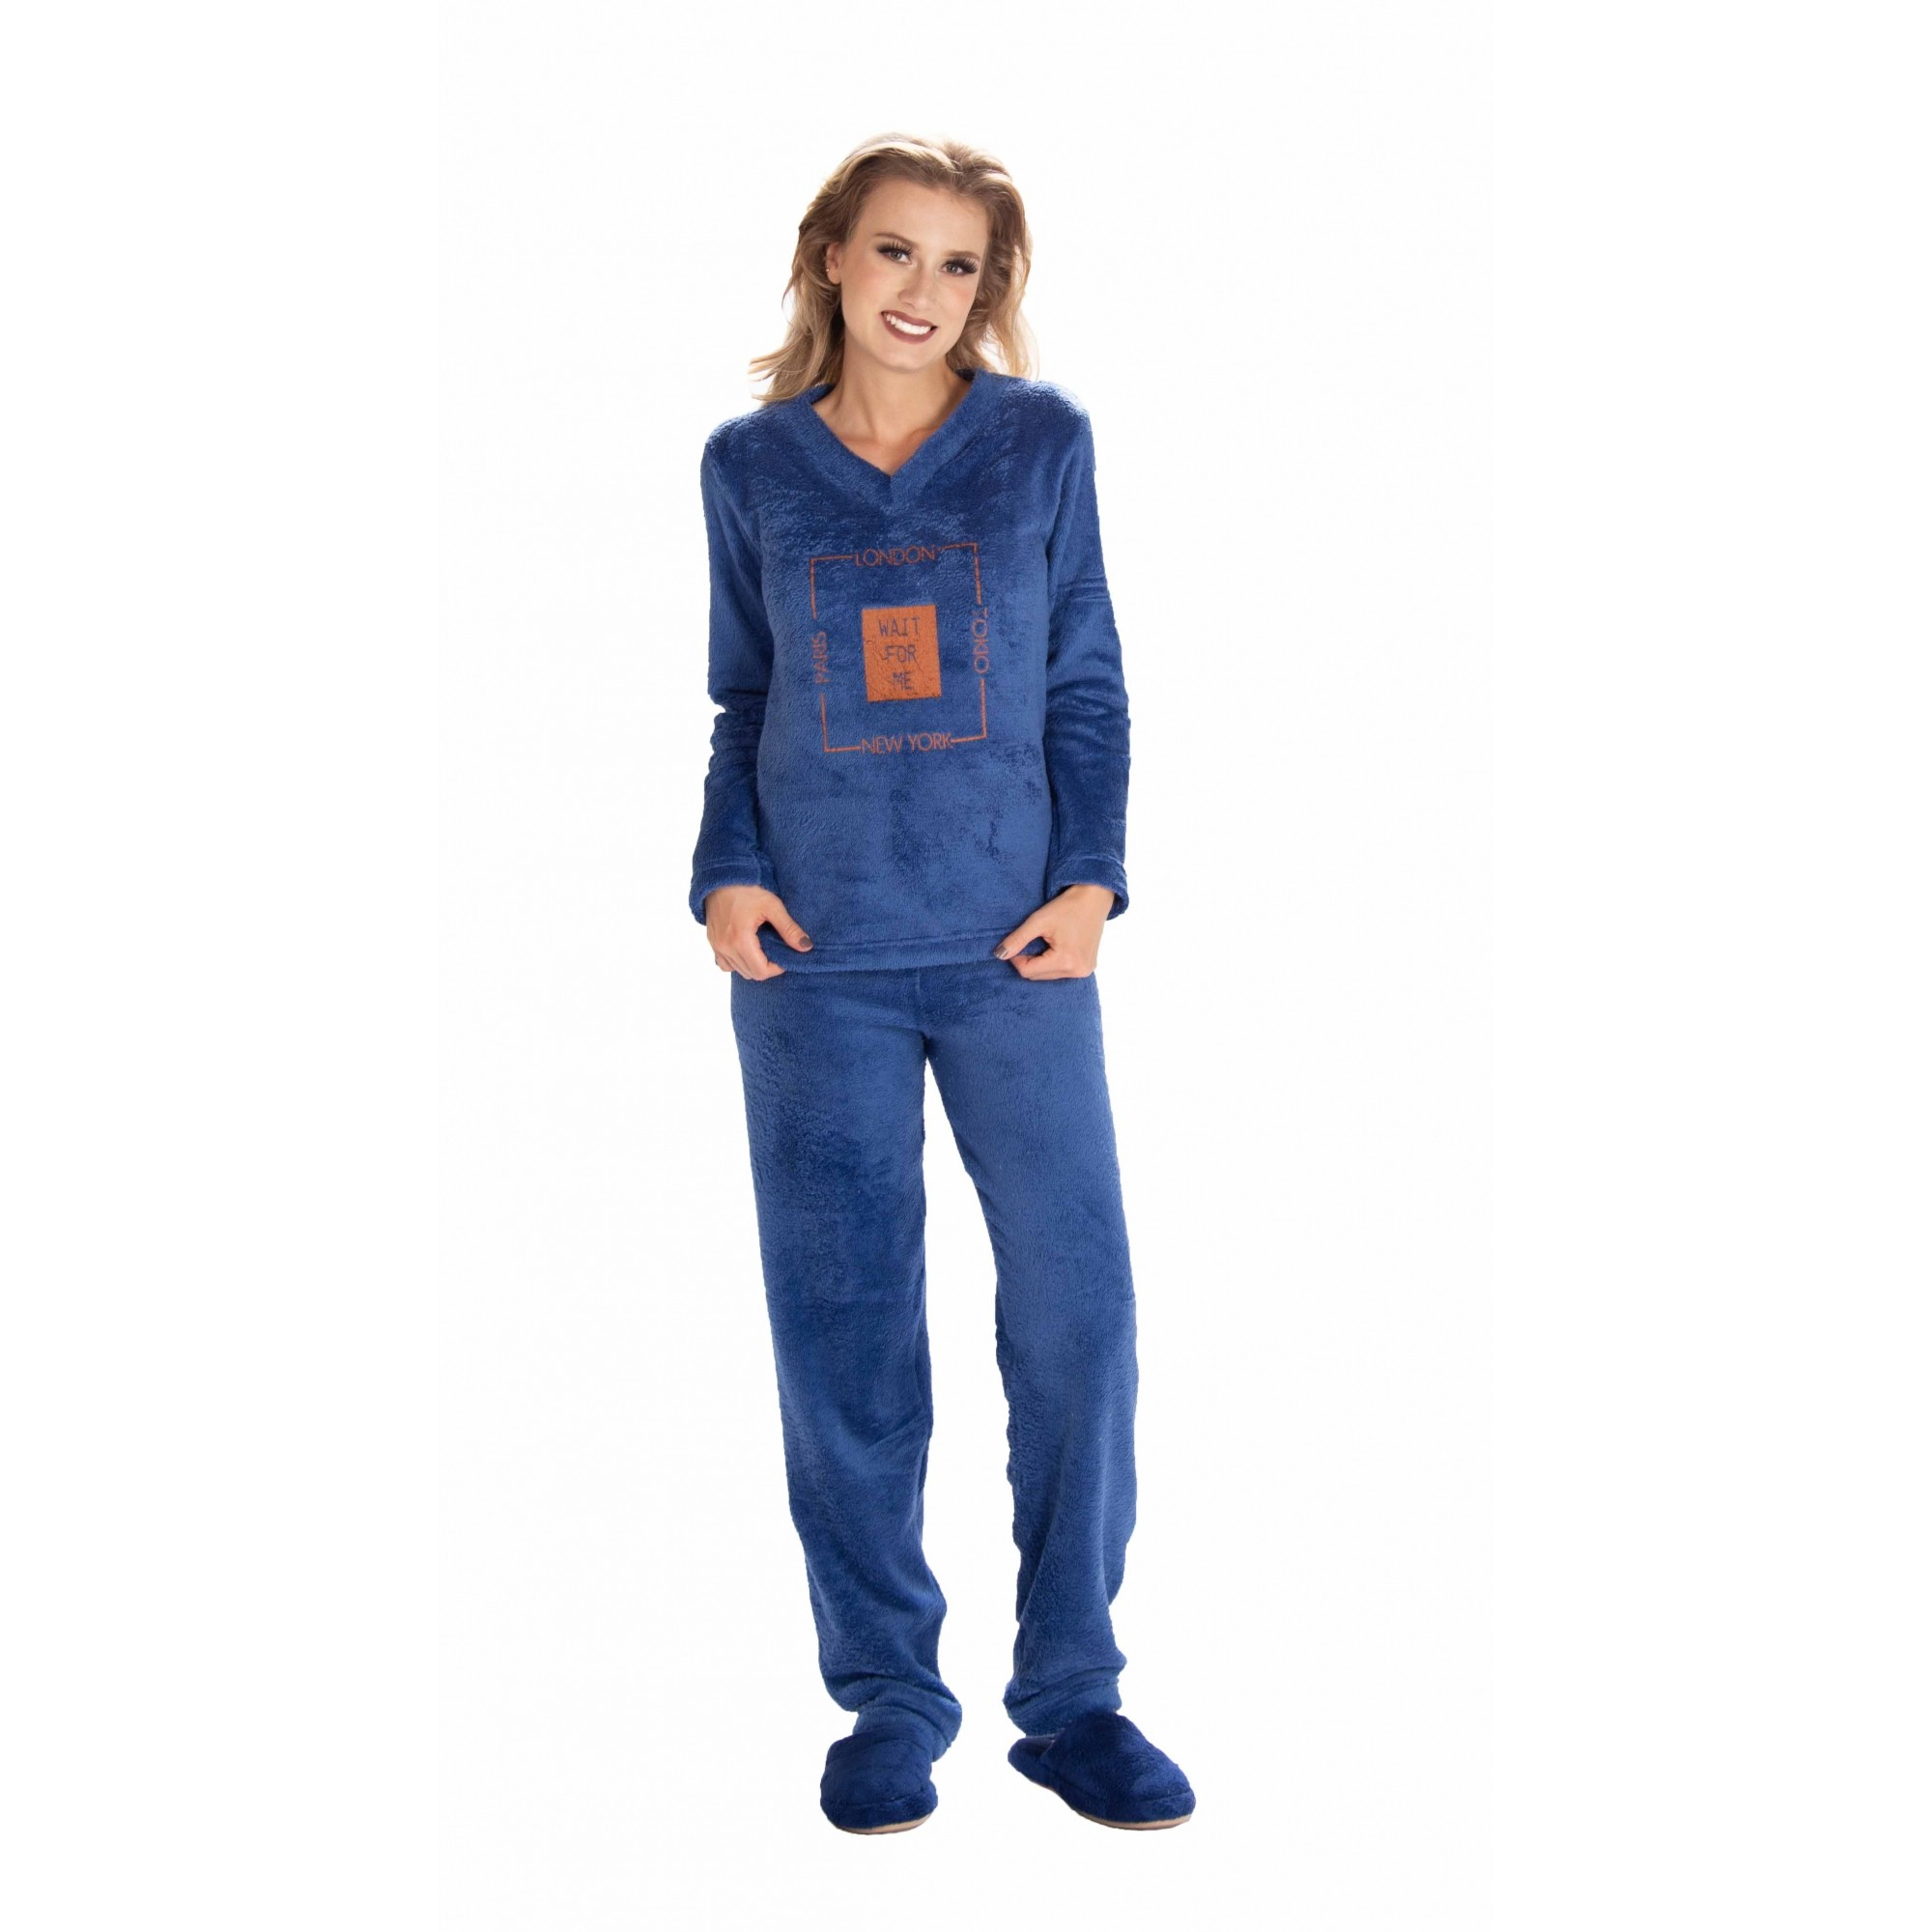 Pijama Feminino Vairelli Inverno Fleece Poliéster Ane quentinho 103241  - Vairelli Chinelos Pijamas Robes